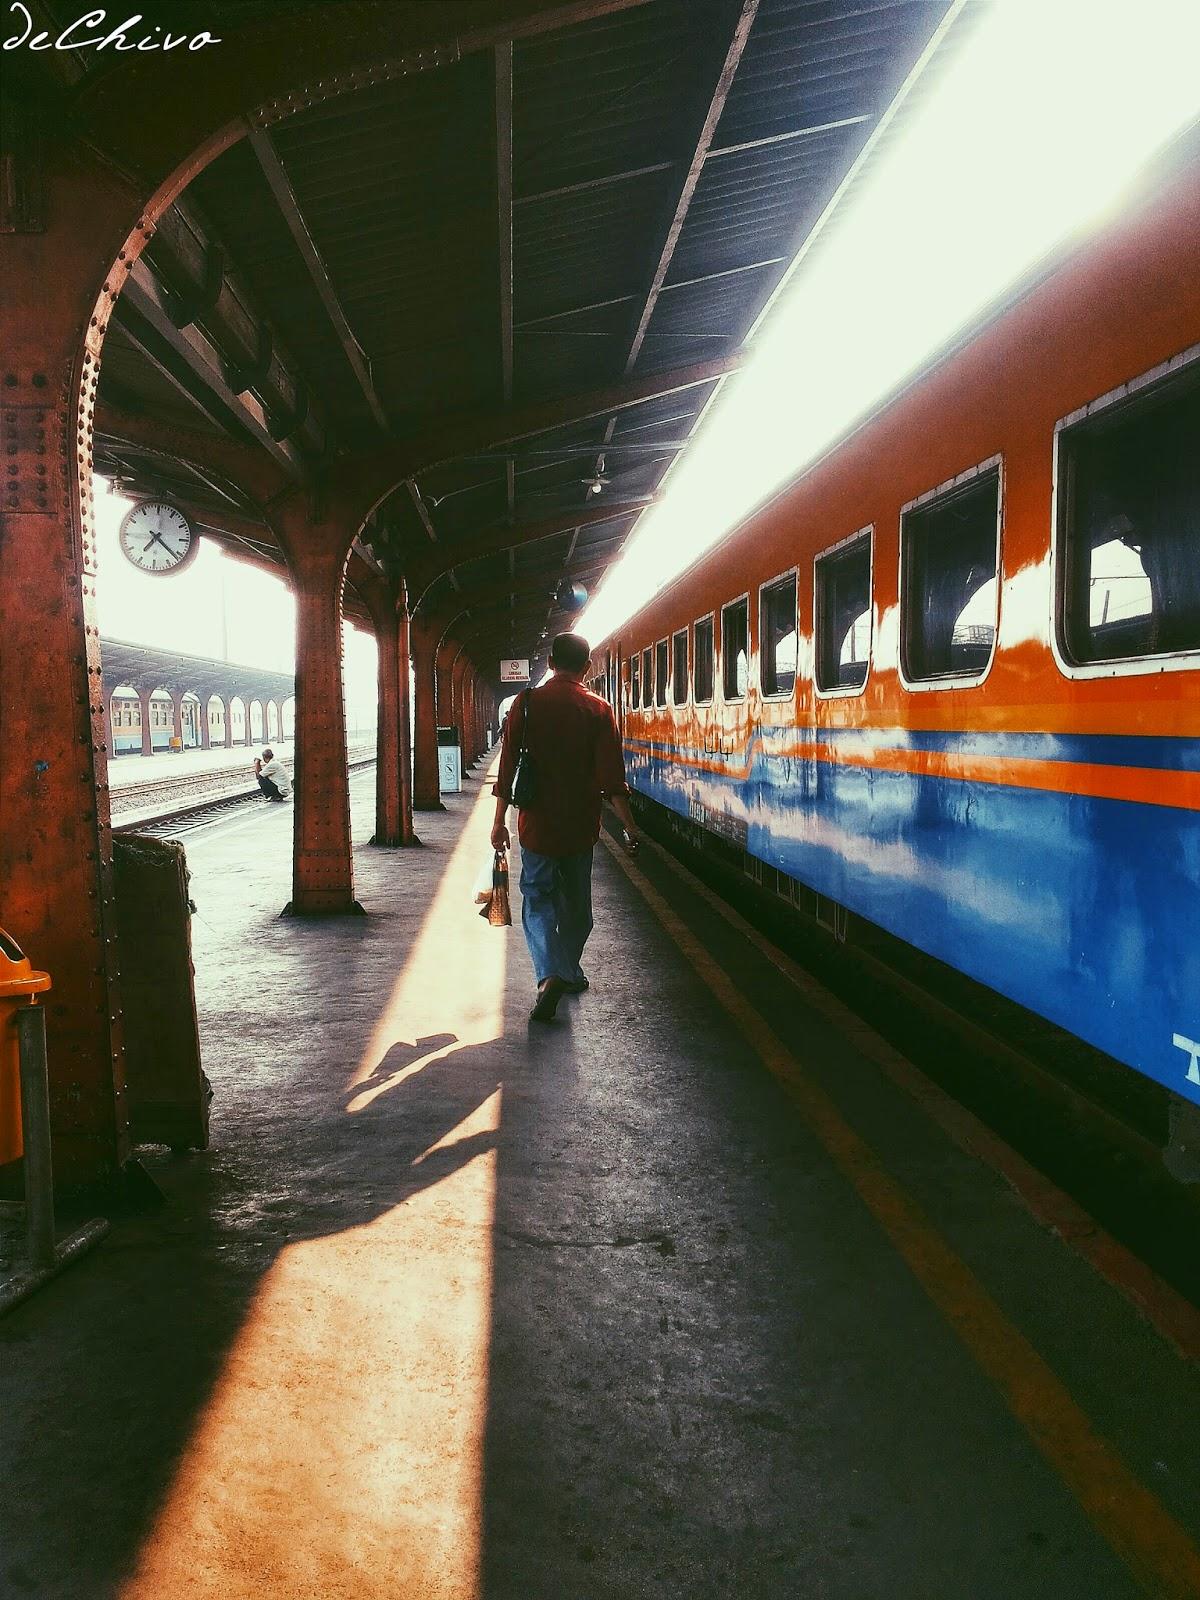 Naik kereta sendirian pagi-pagi di Stasiun Kota